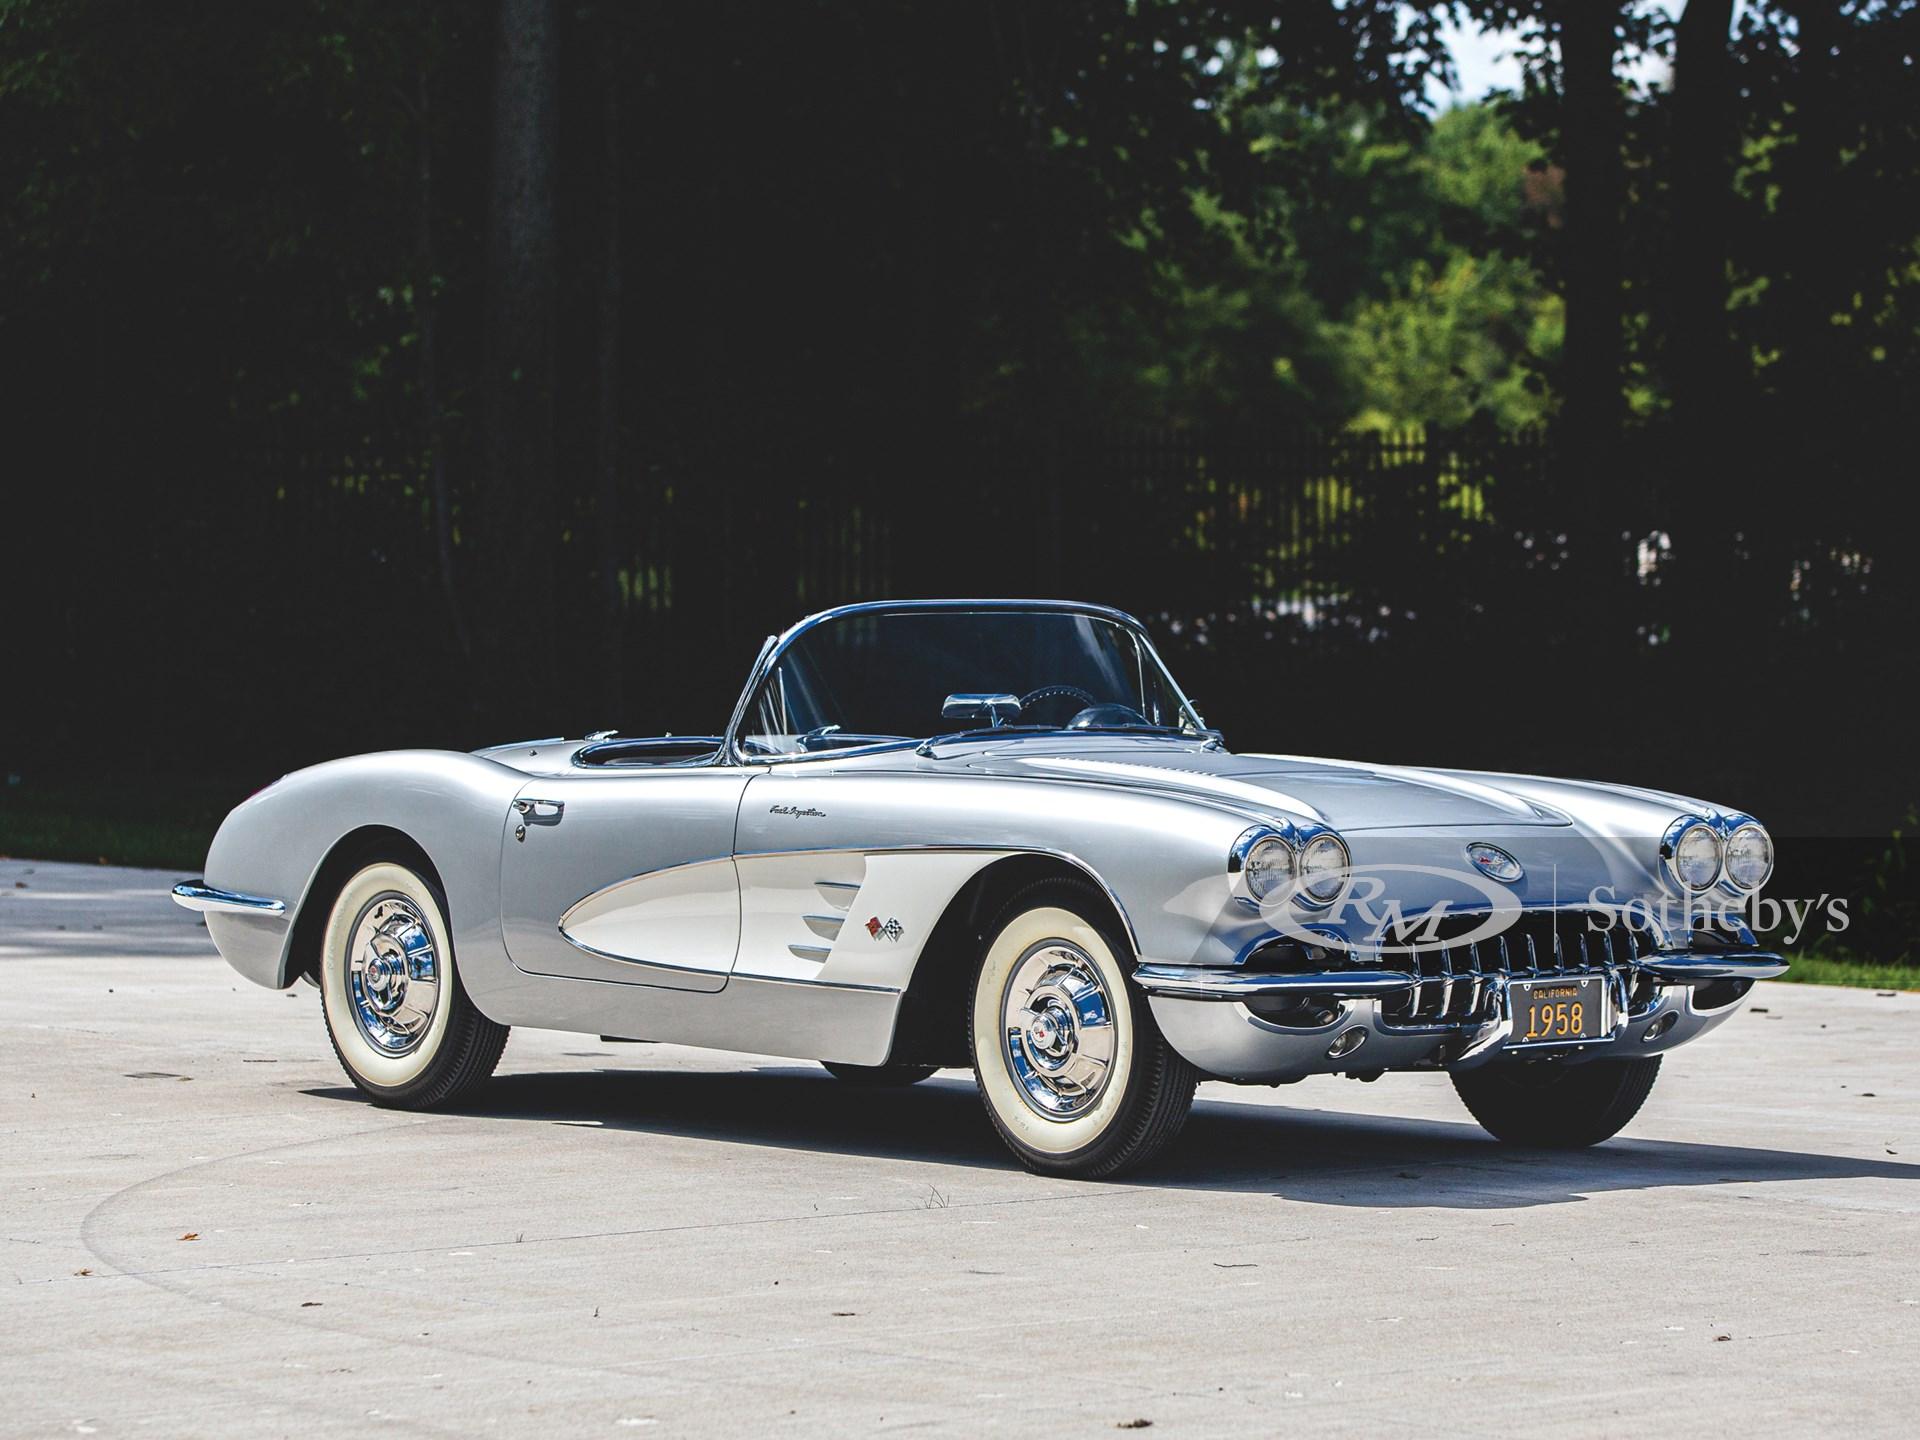 1958 Chevrolet Corvette 'Fuel-Injected'  -